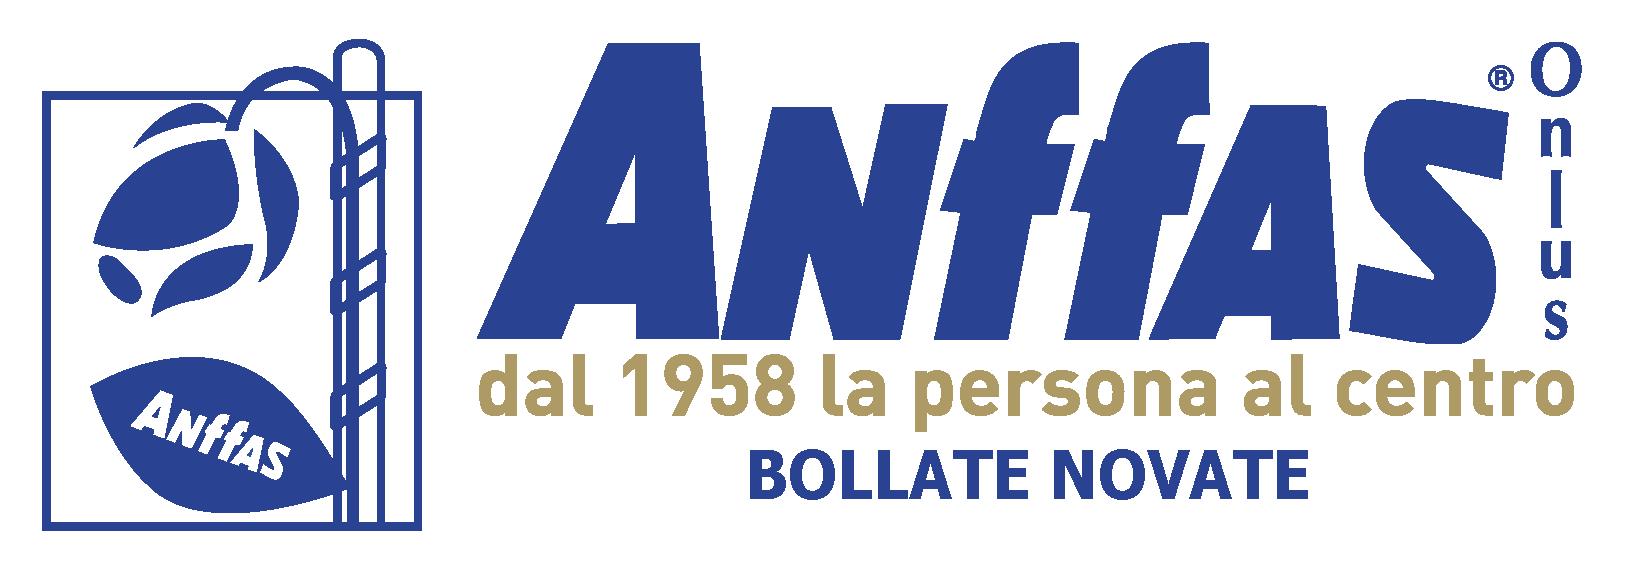 ANFFAS Bollate Novate